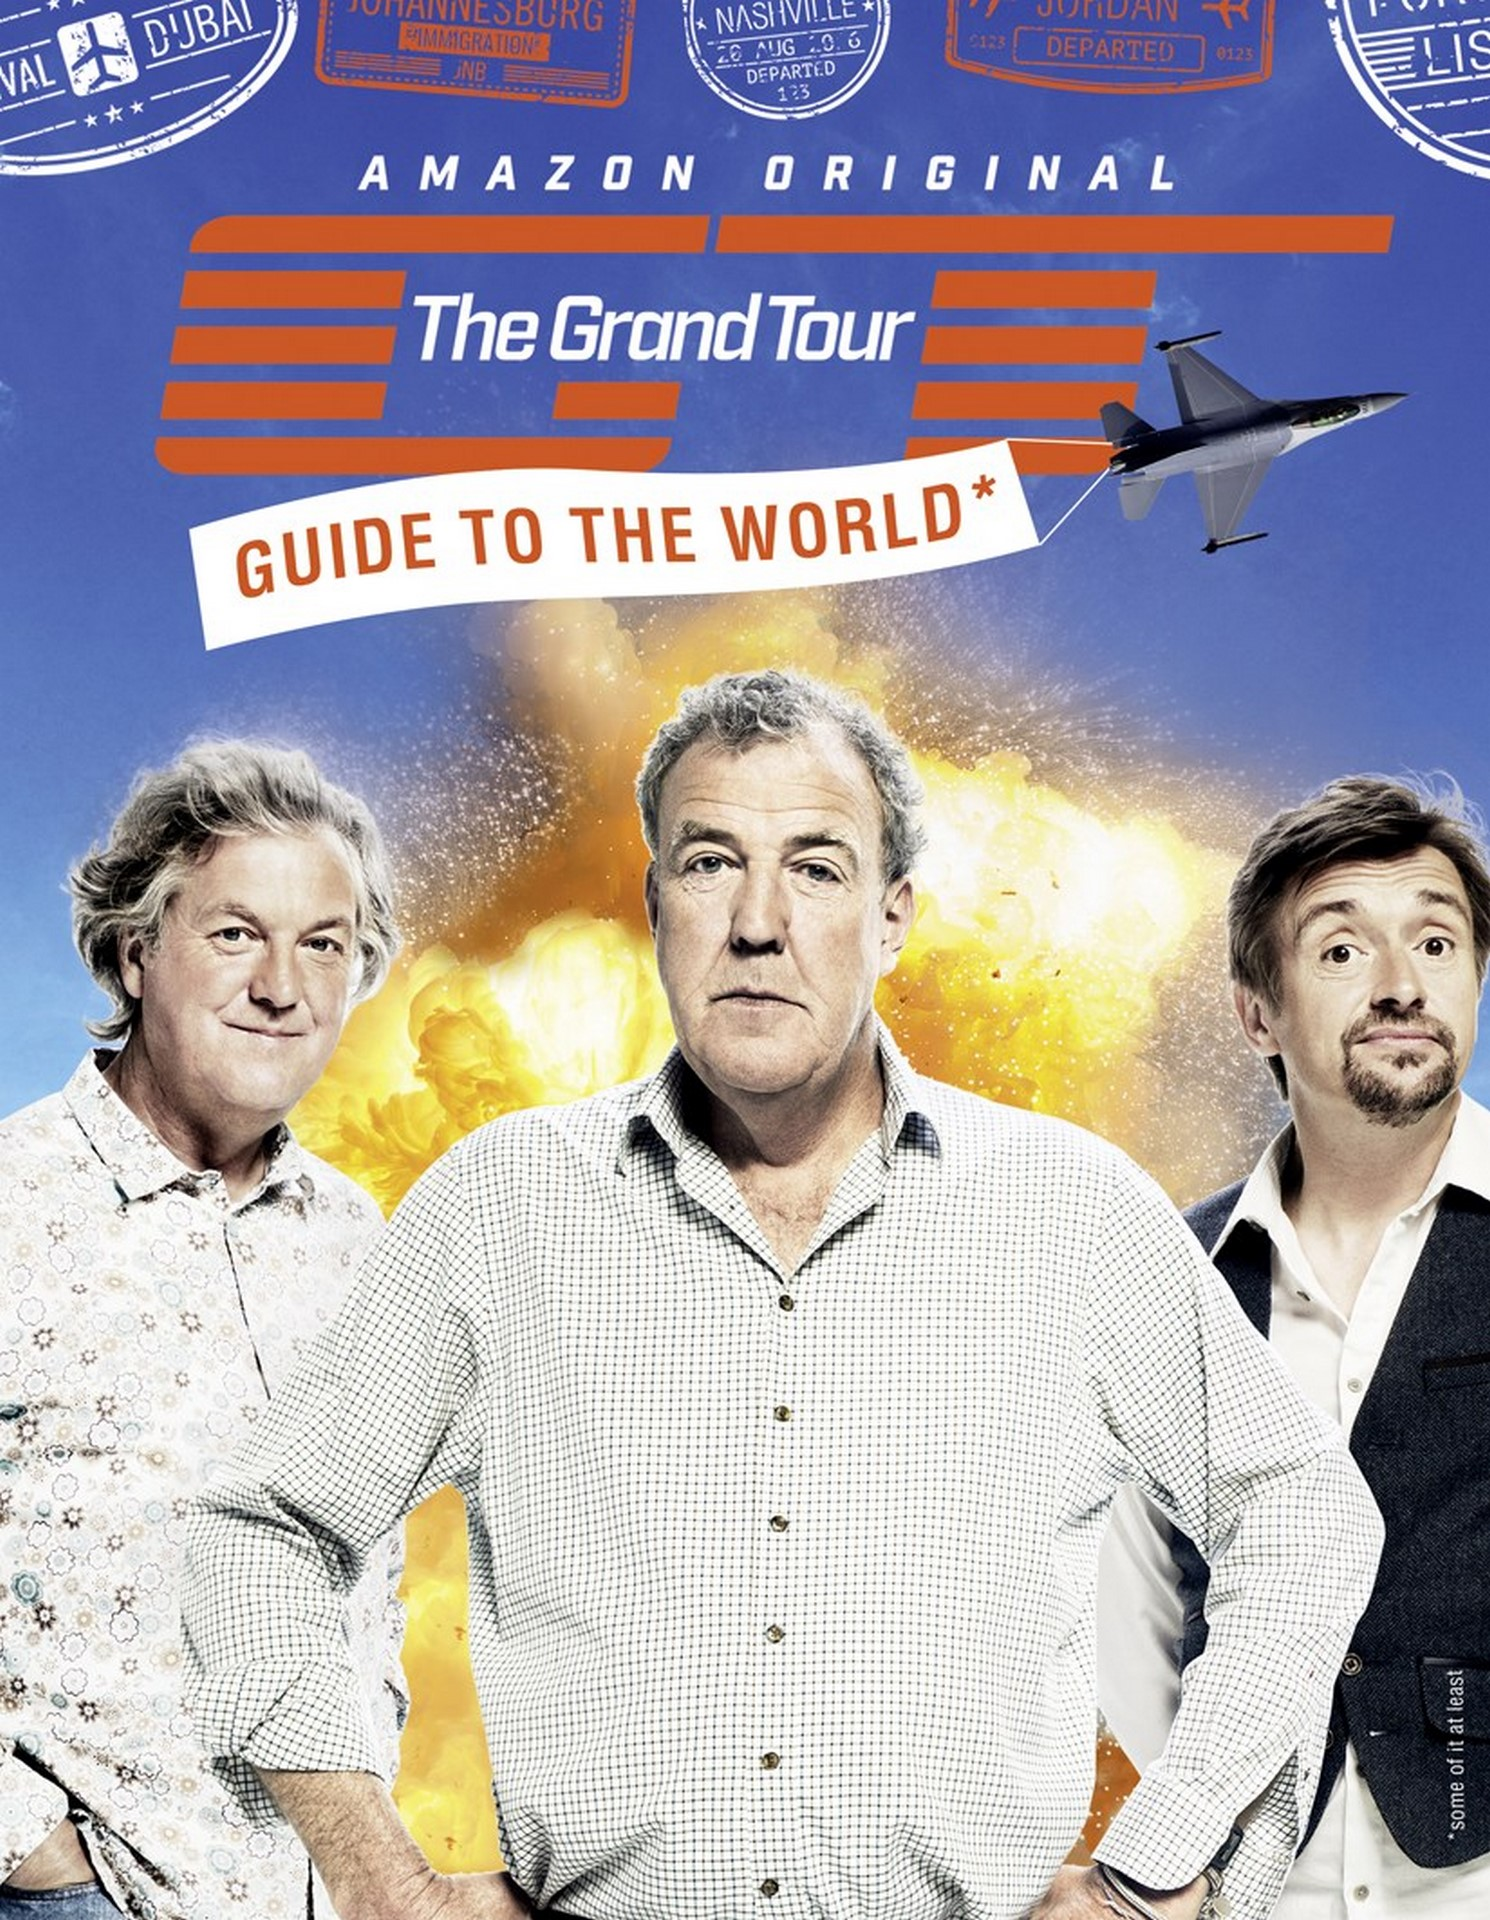 The Grand Tour (10)